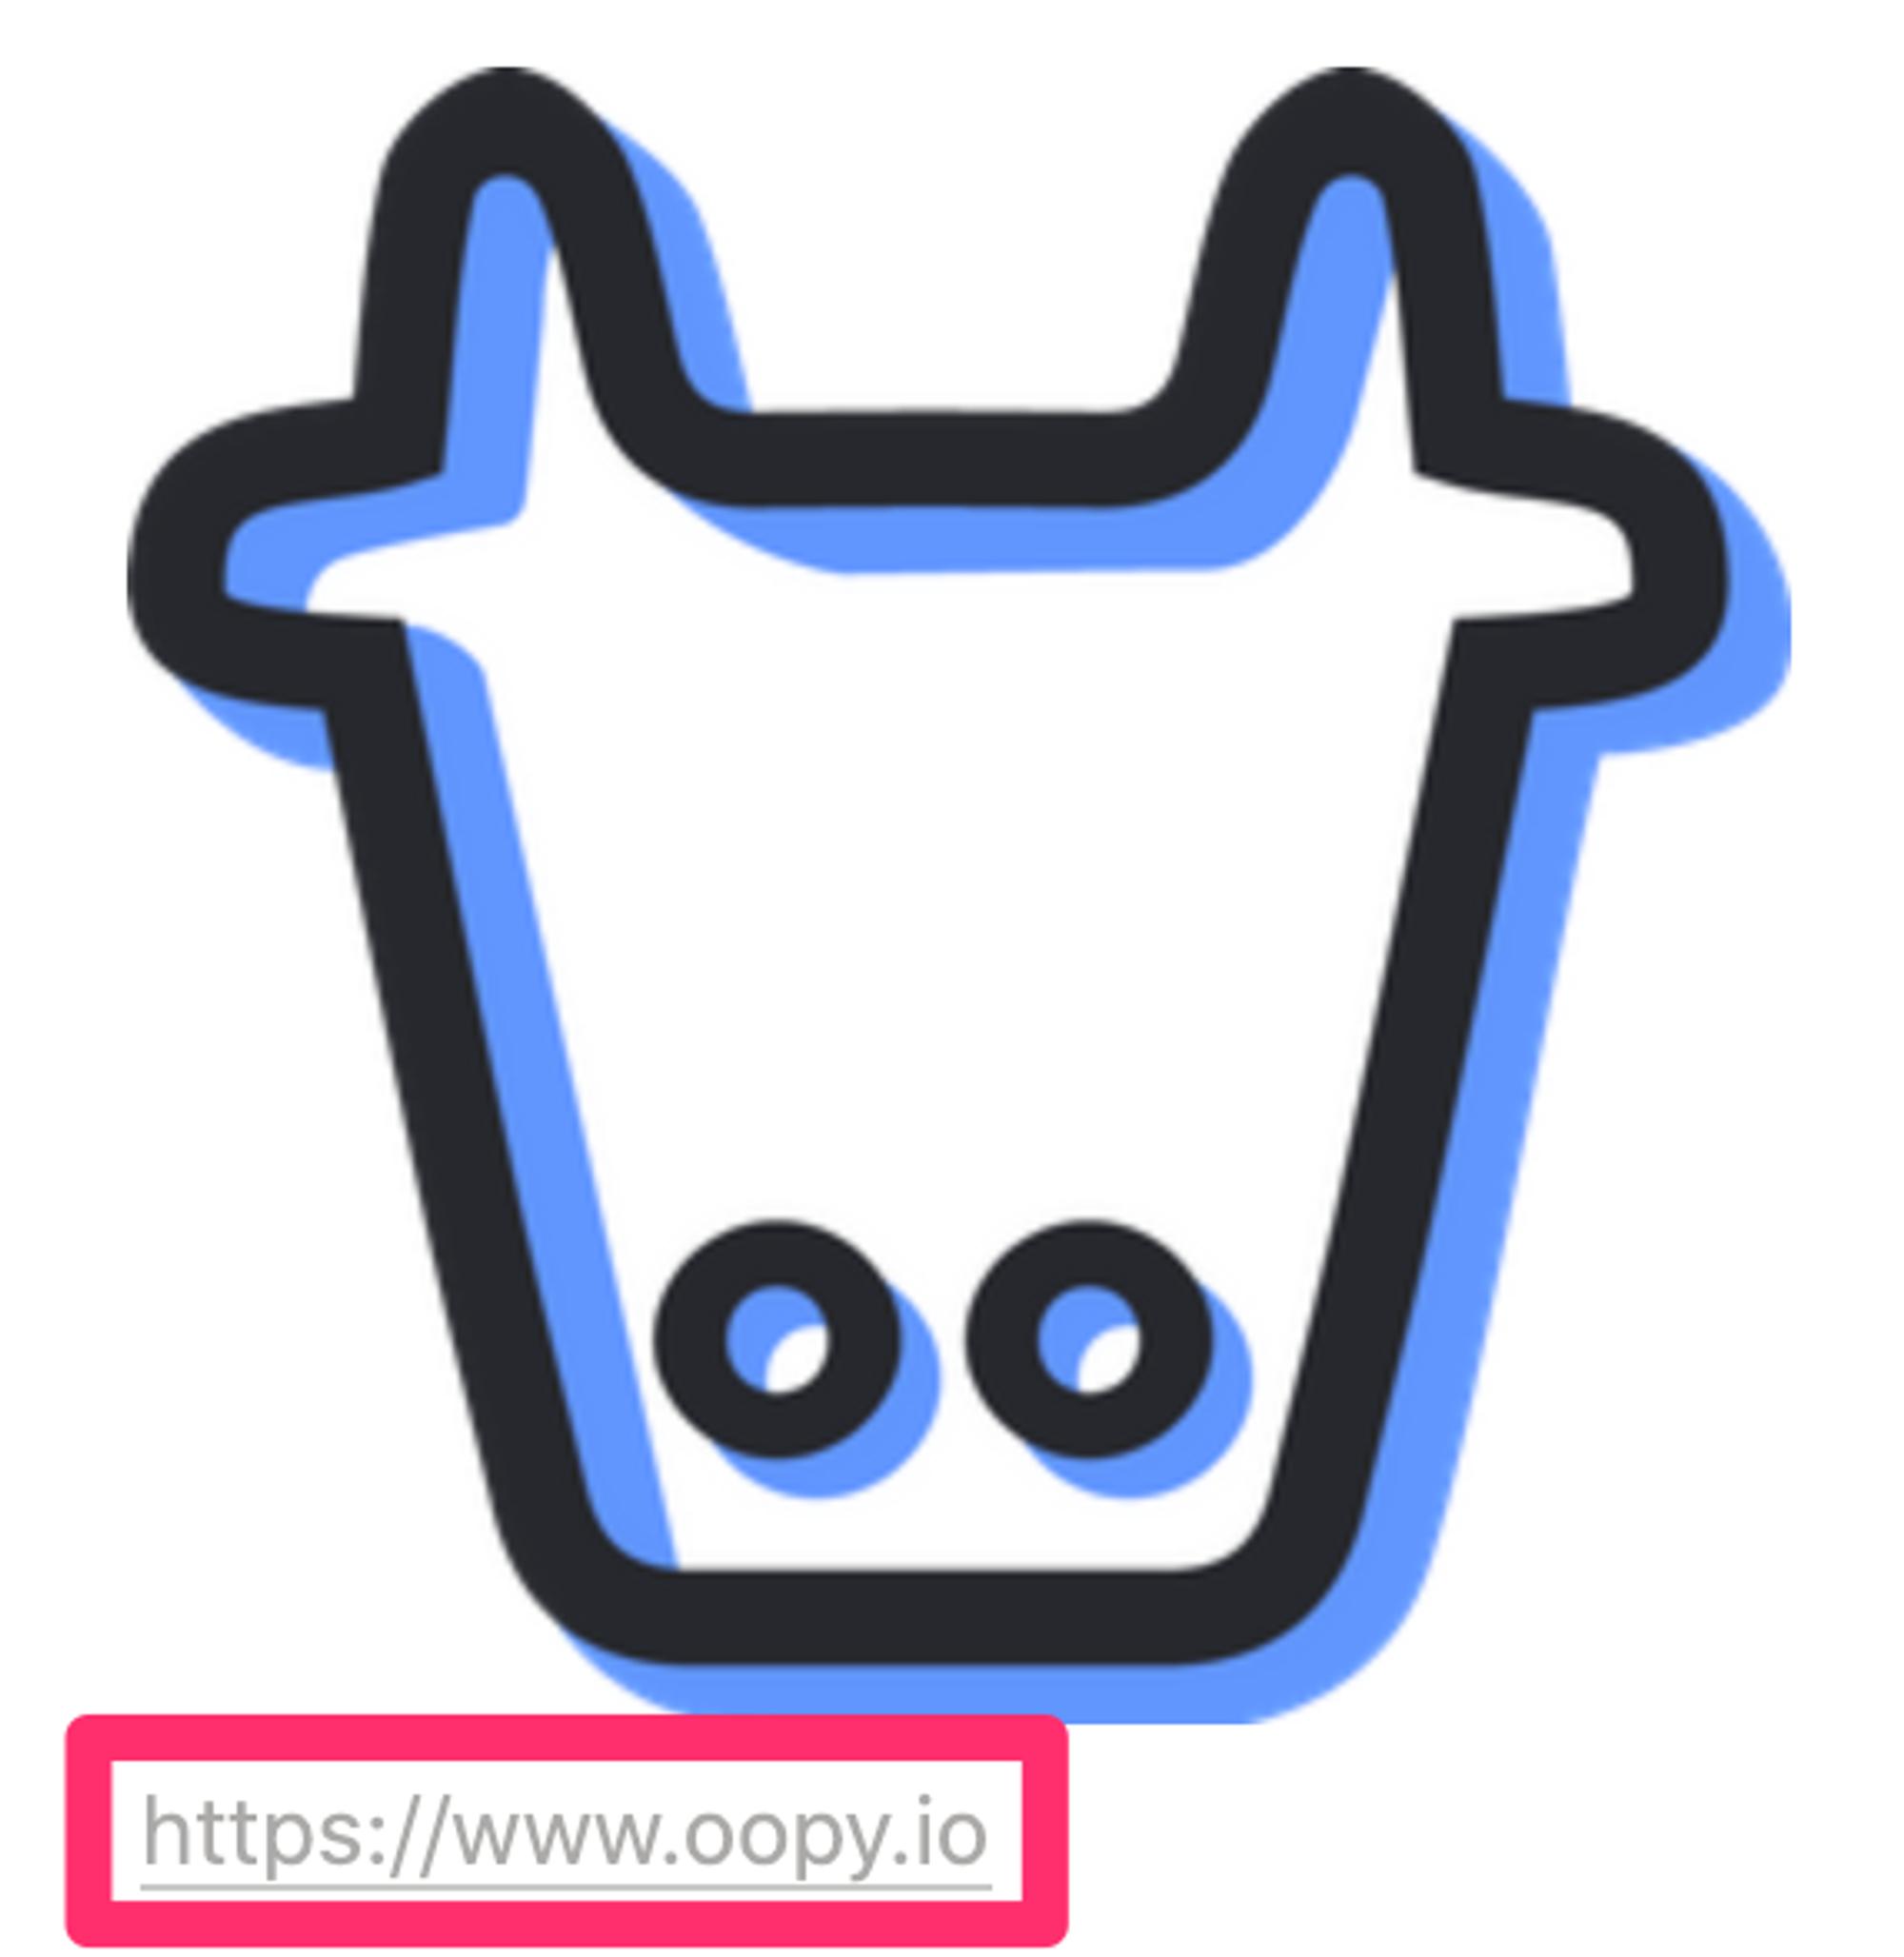 Image_Link.png